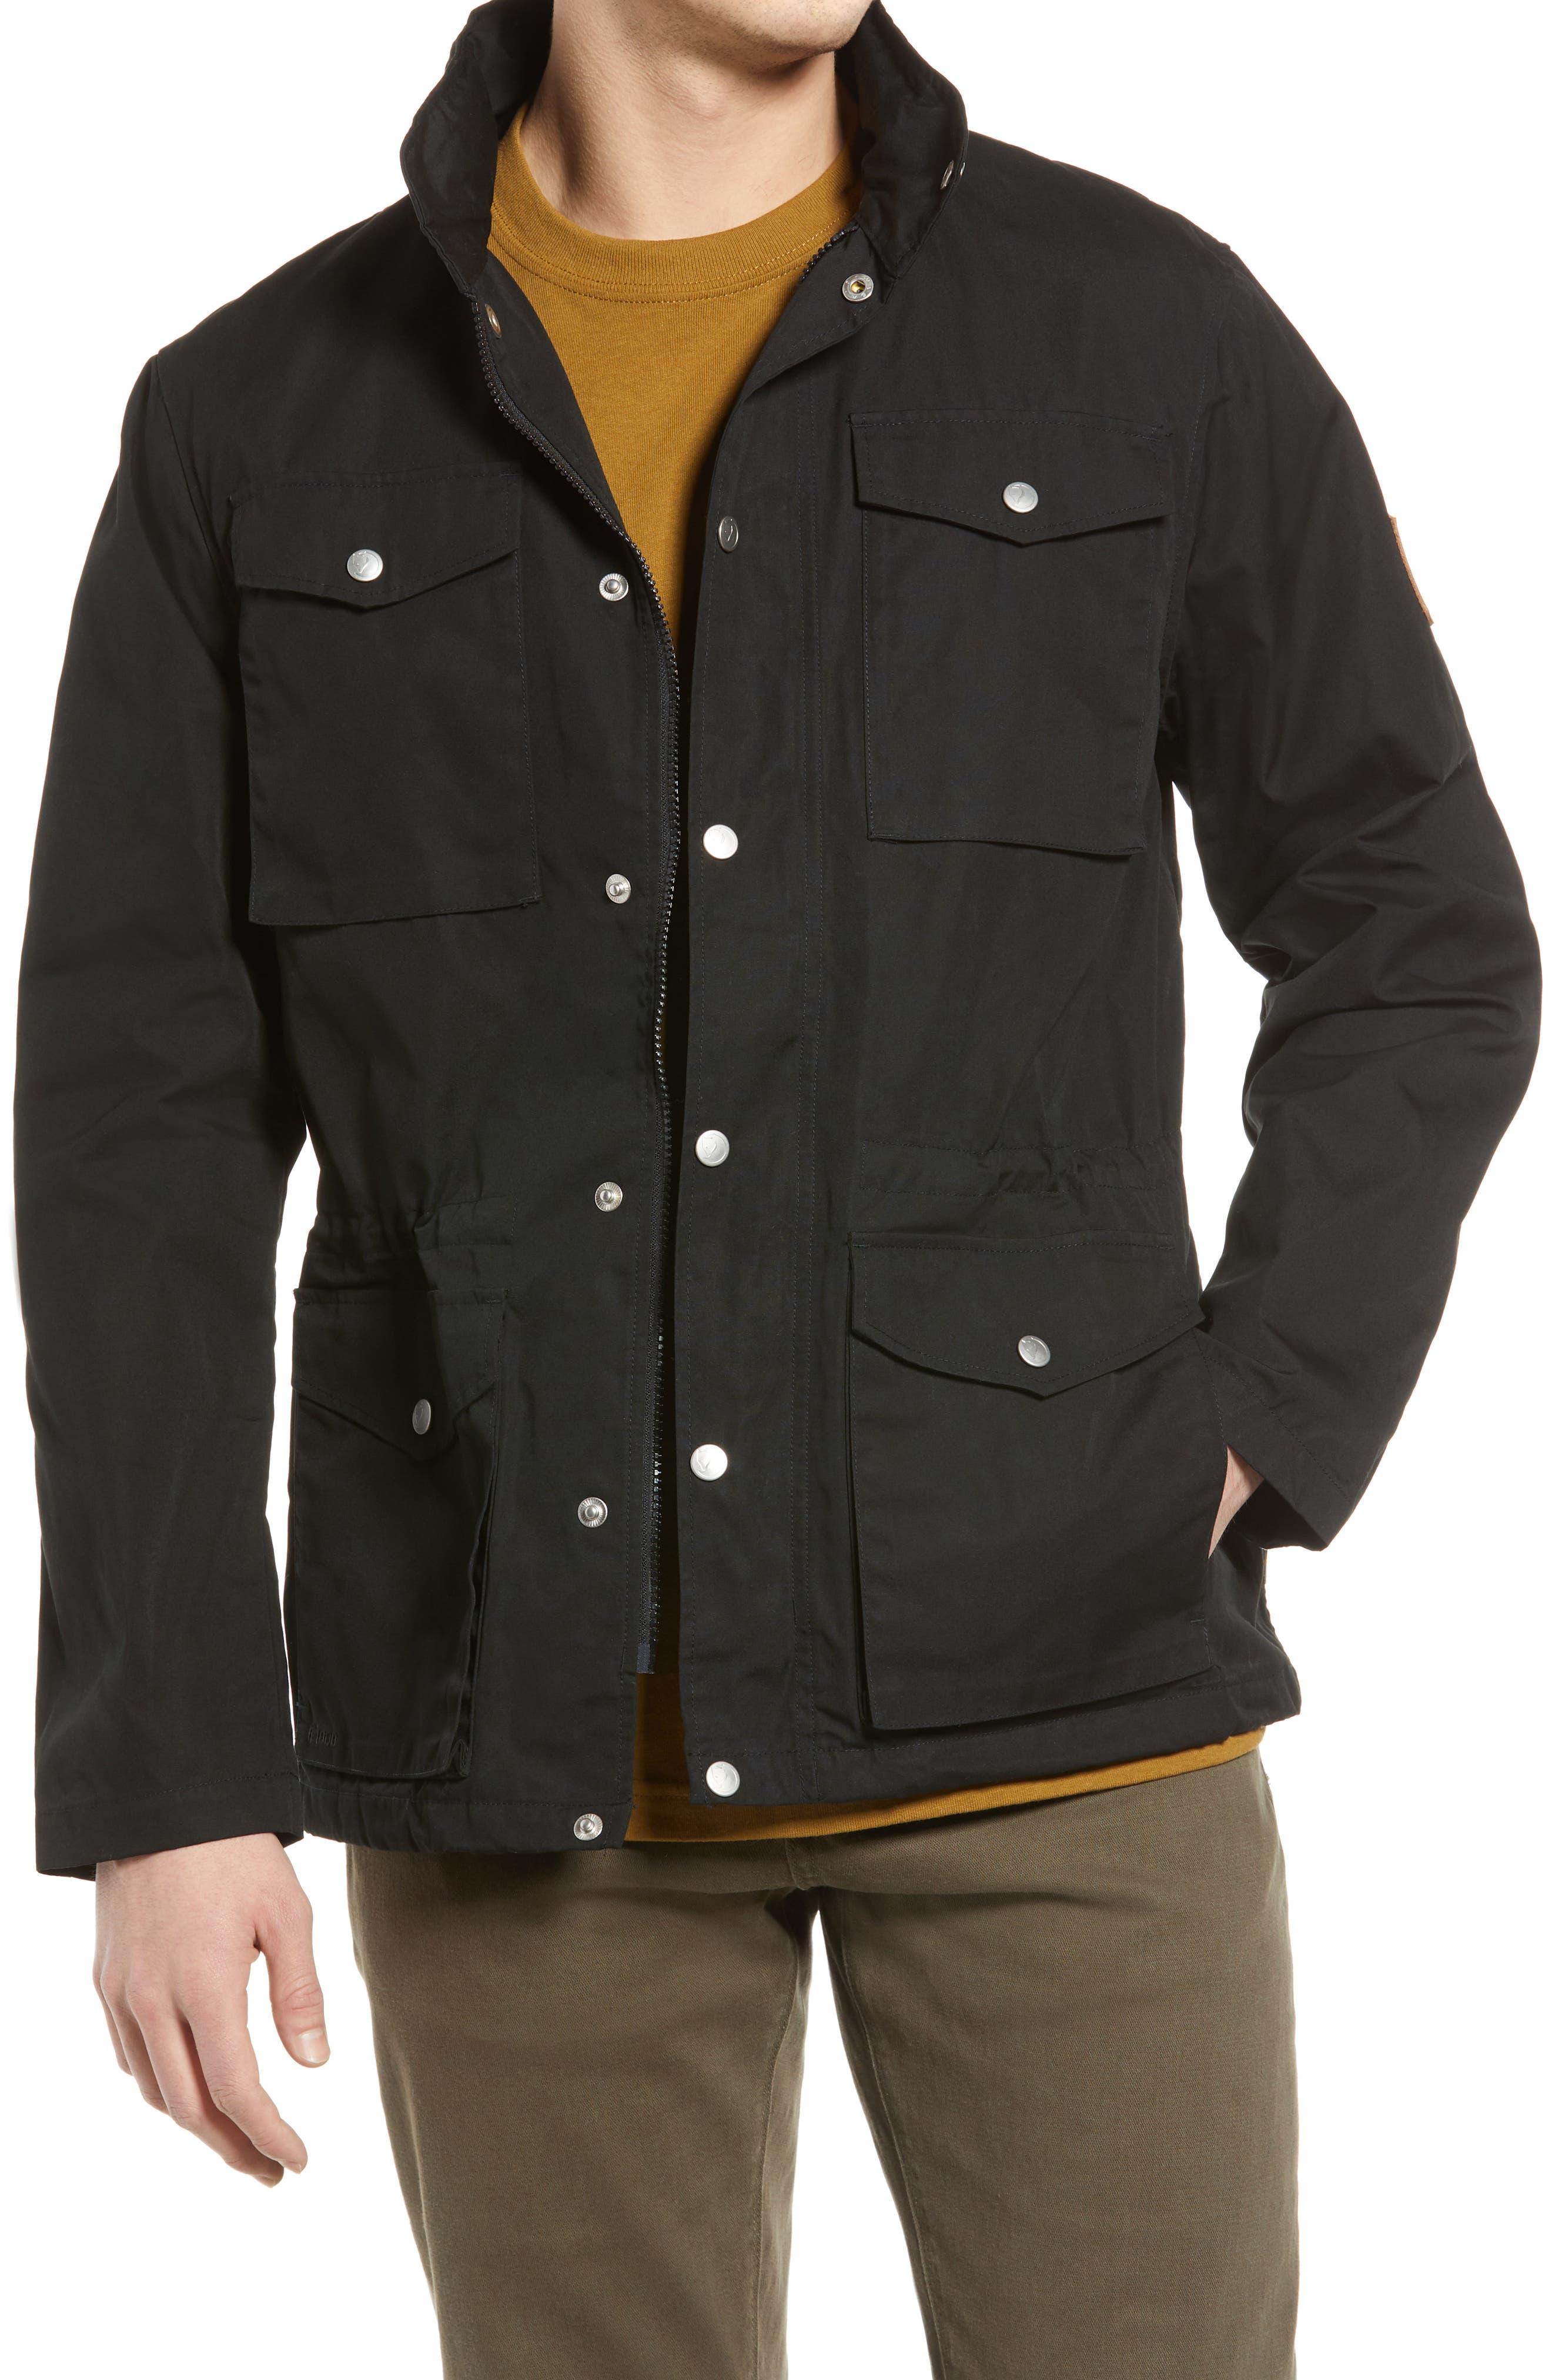 Rven Water Resistant Field Jacket